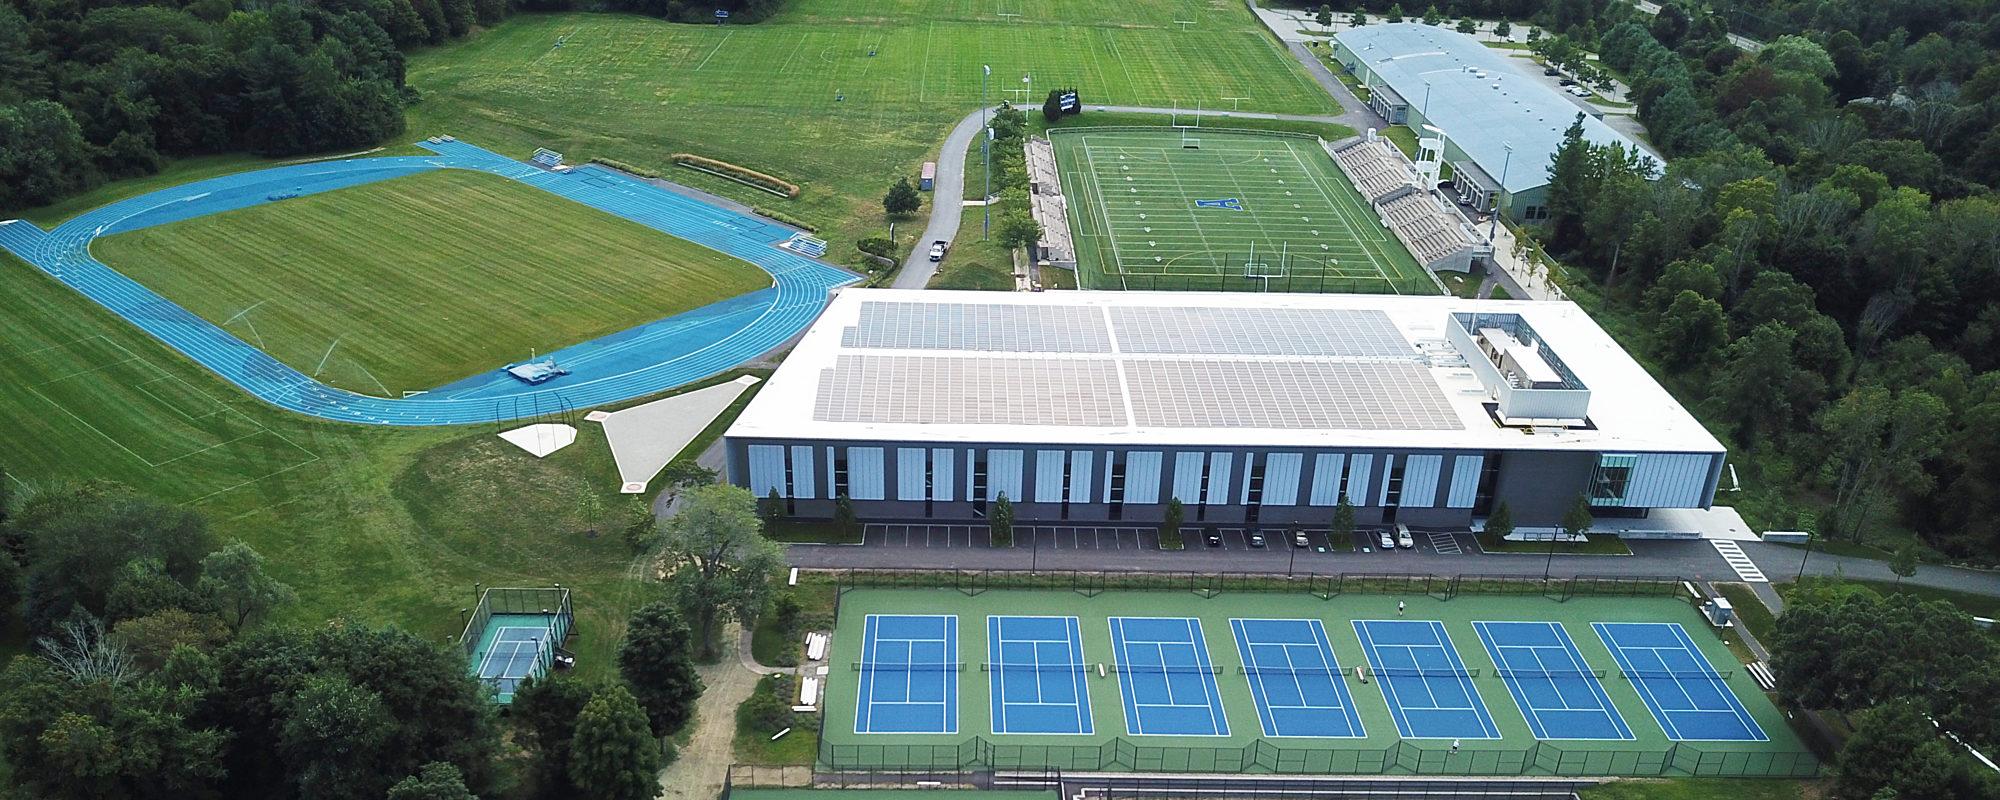 Athletics Drone